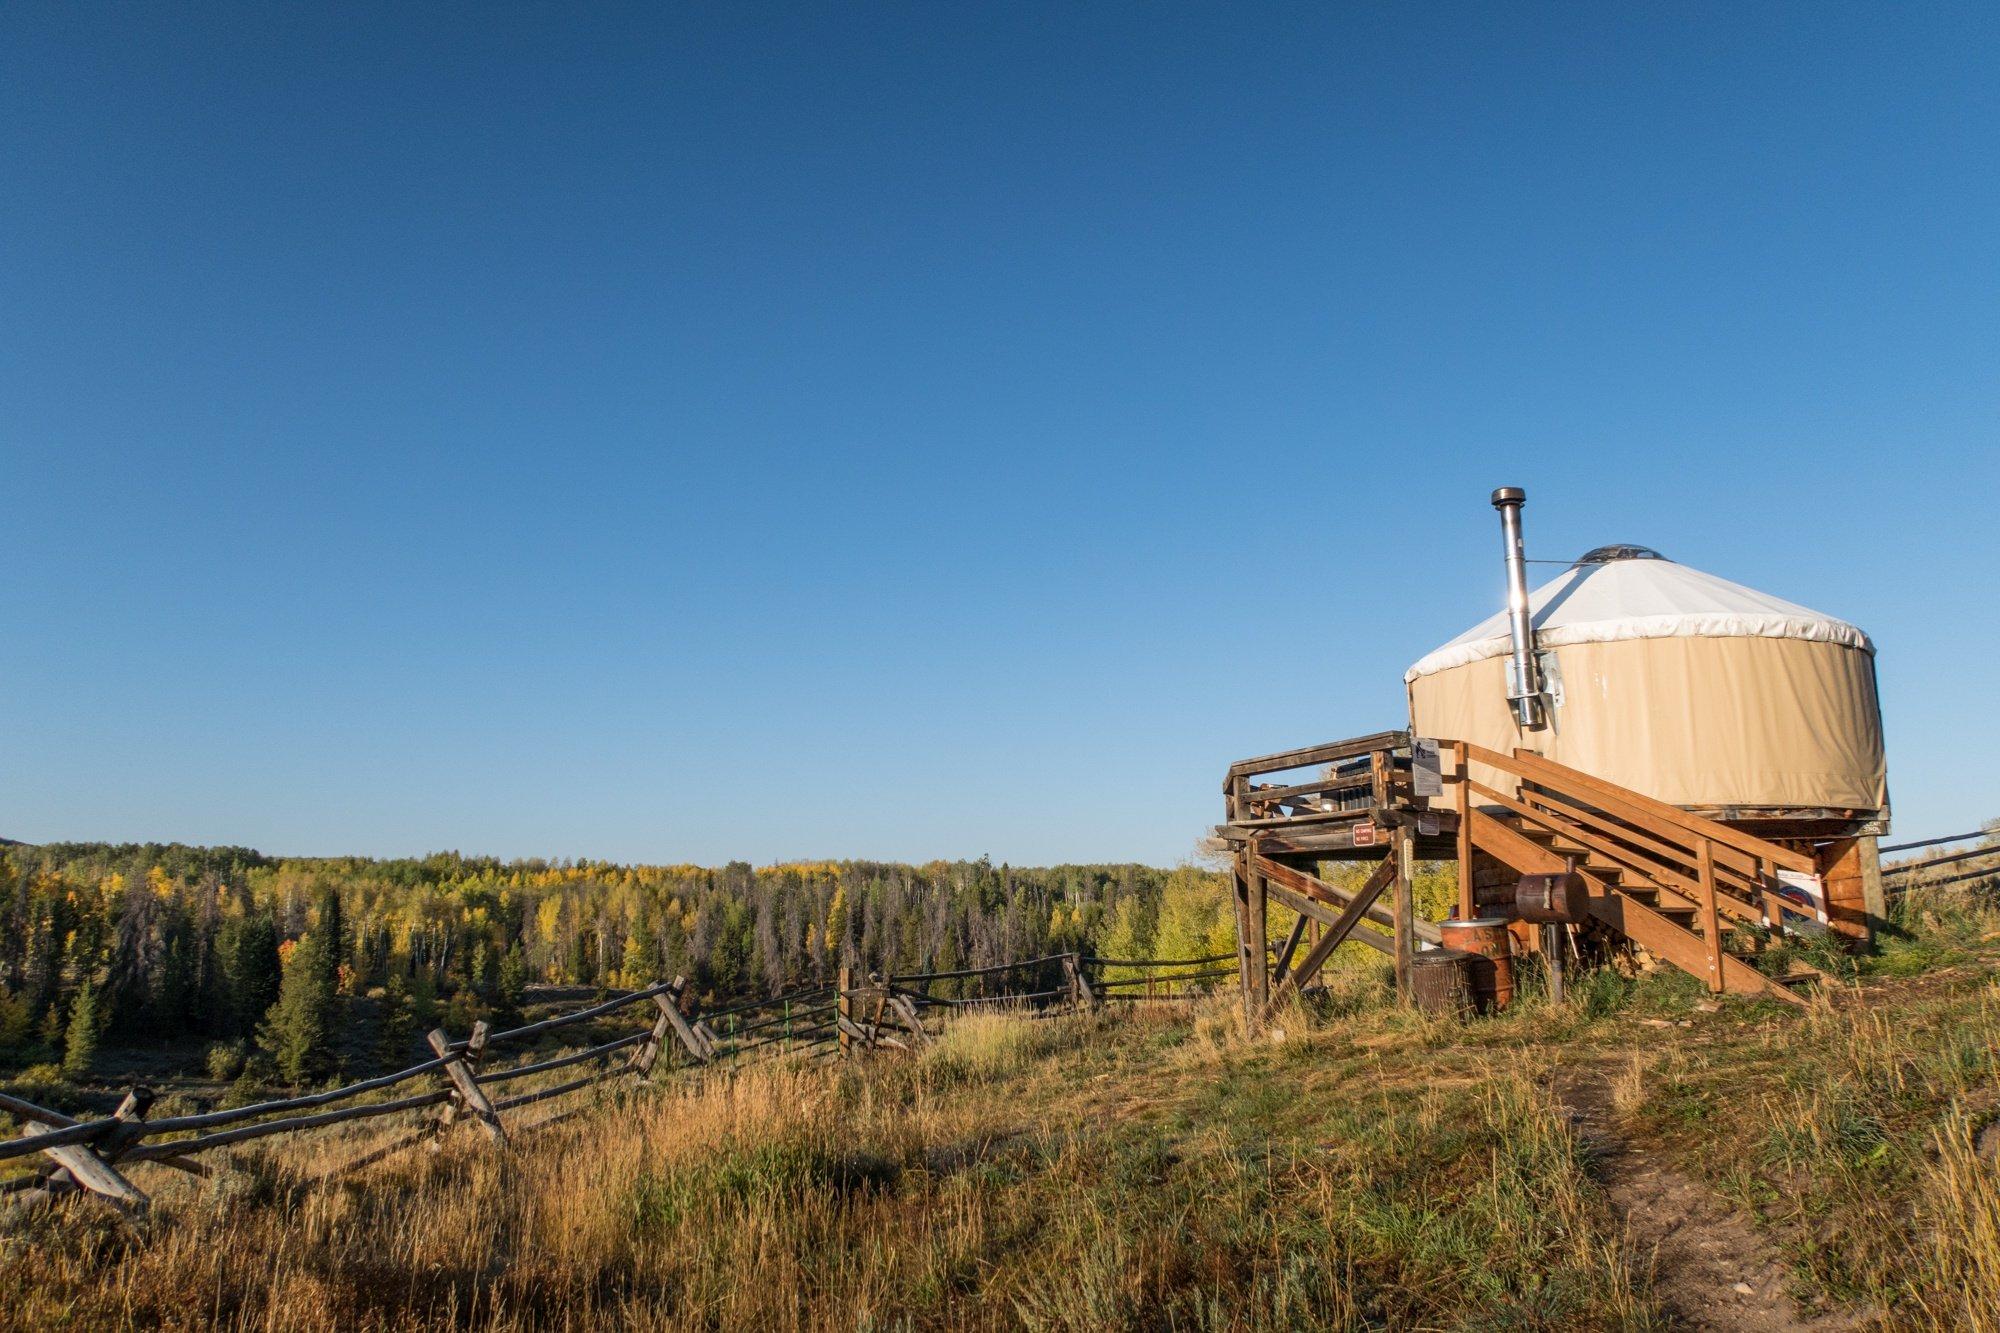 North Fork Candian Yurt at sunrise